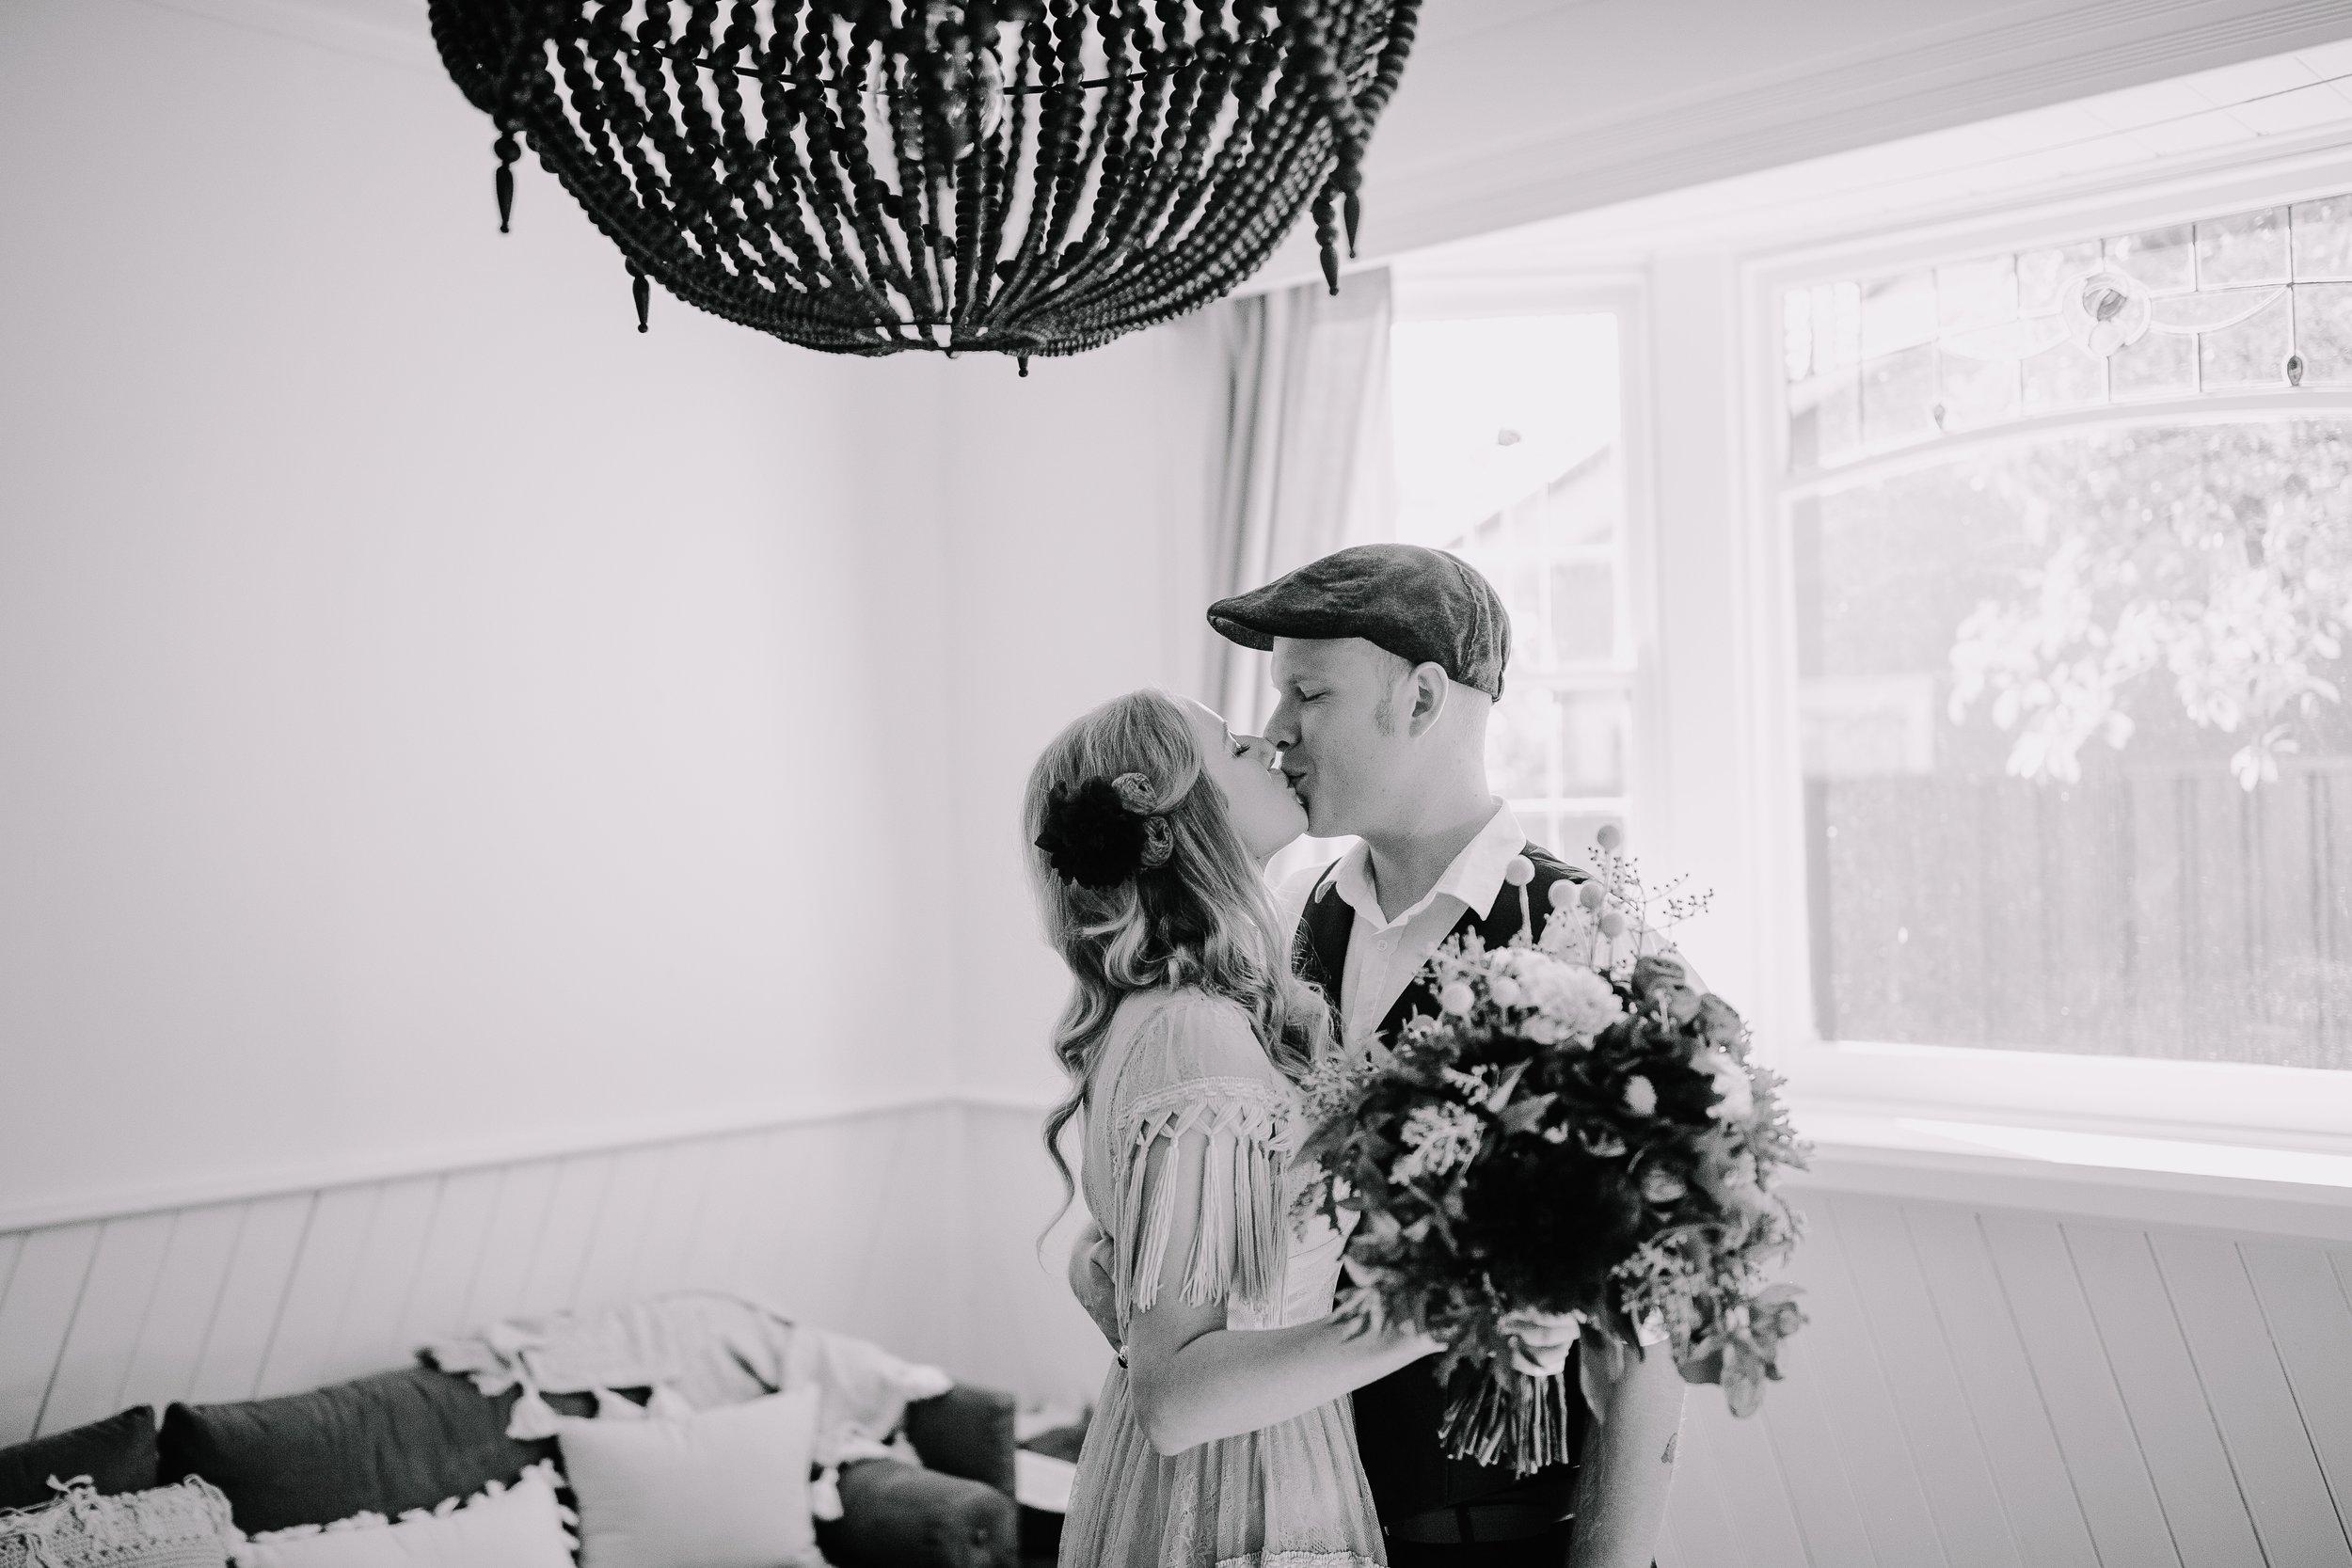 mickalathomas_puremacphotography_weddingphotographer_couplephotographer_Sheppartonphotographer_2037.jpg